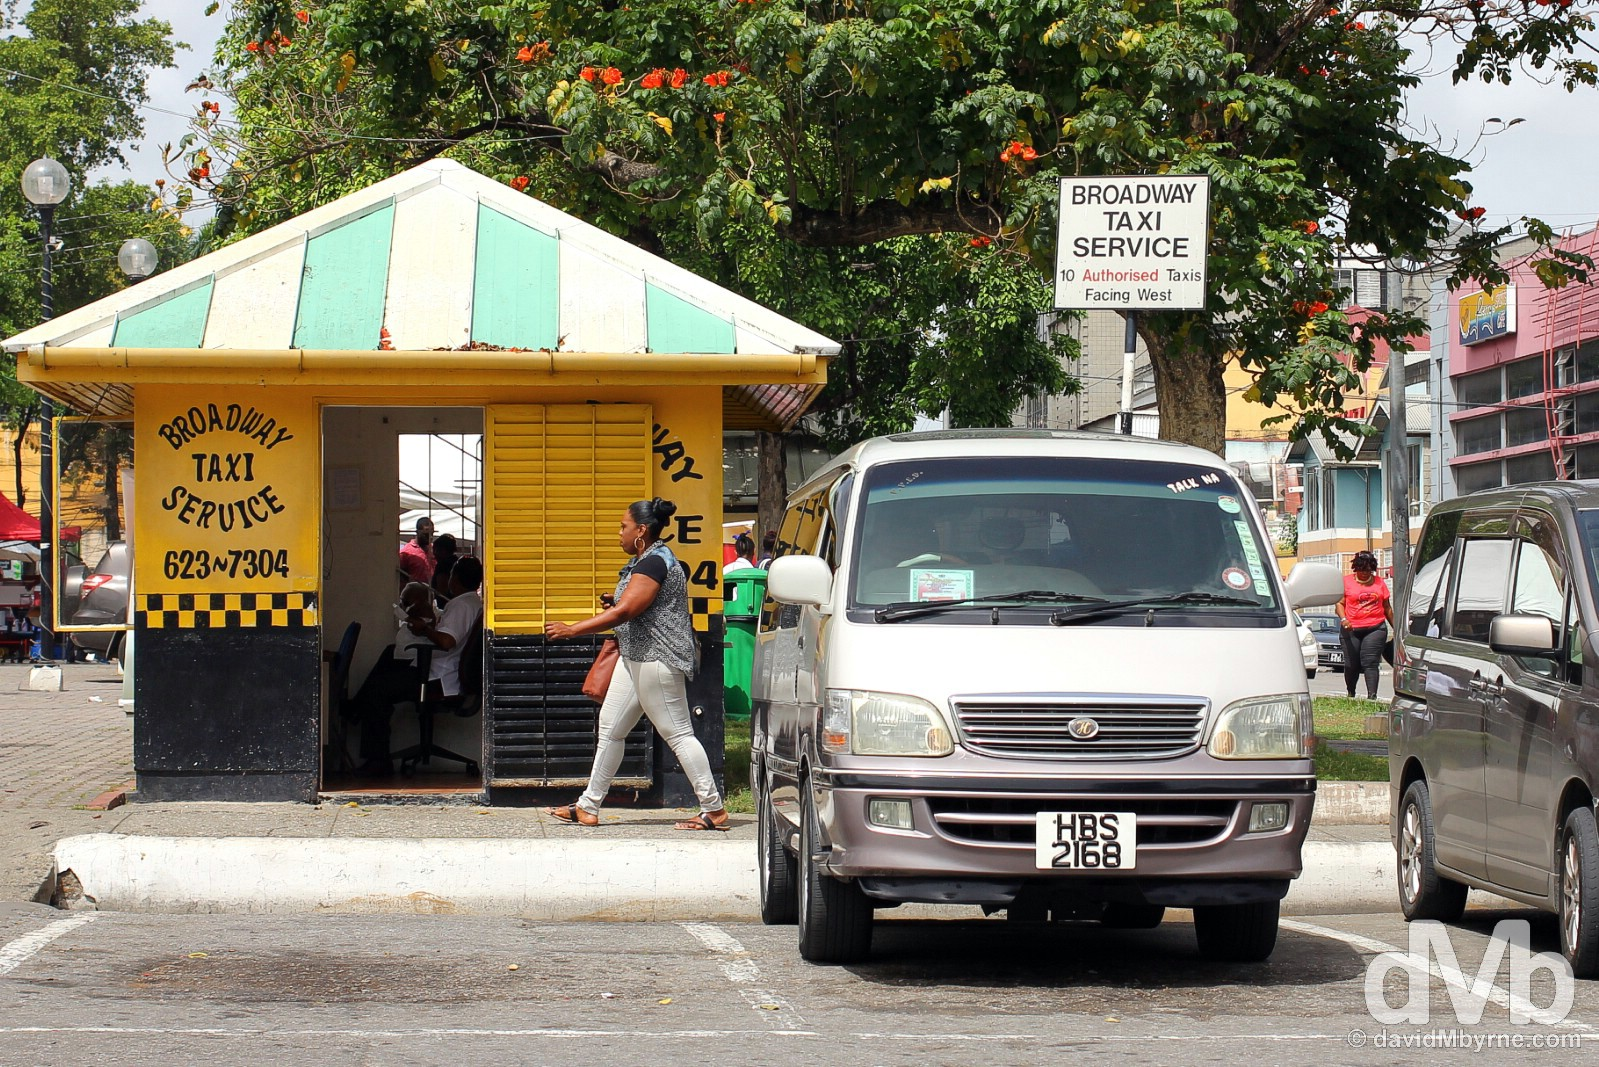 Independence Square, Port of Spain, Trinidad & Tobago, Lesser Antilles. June 18, 2015.